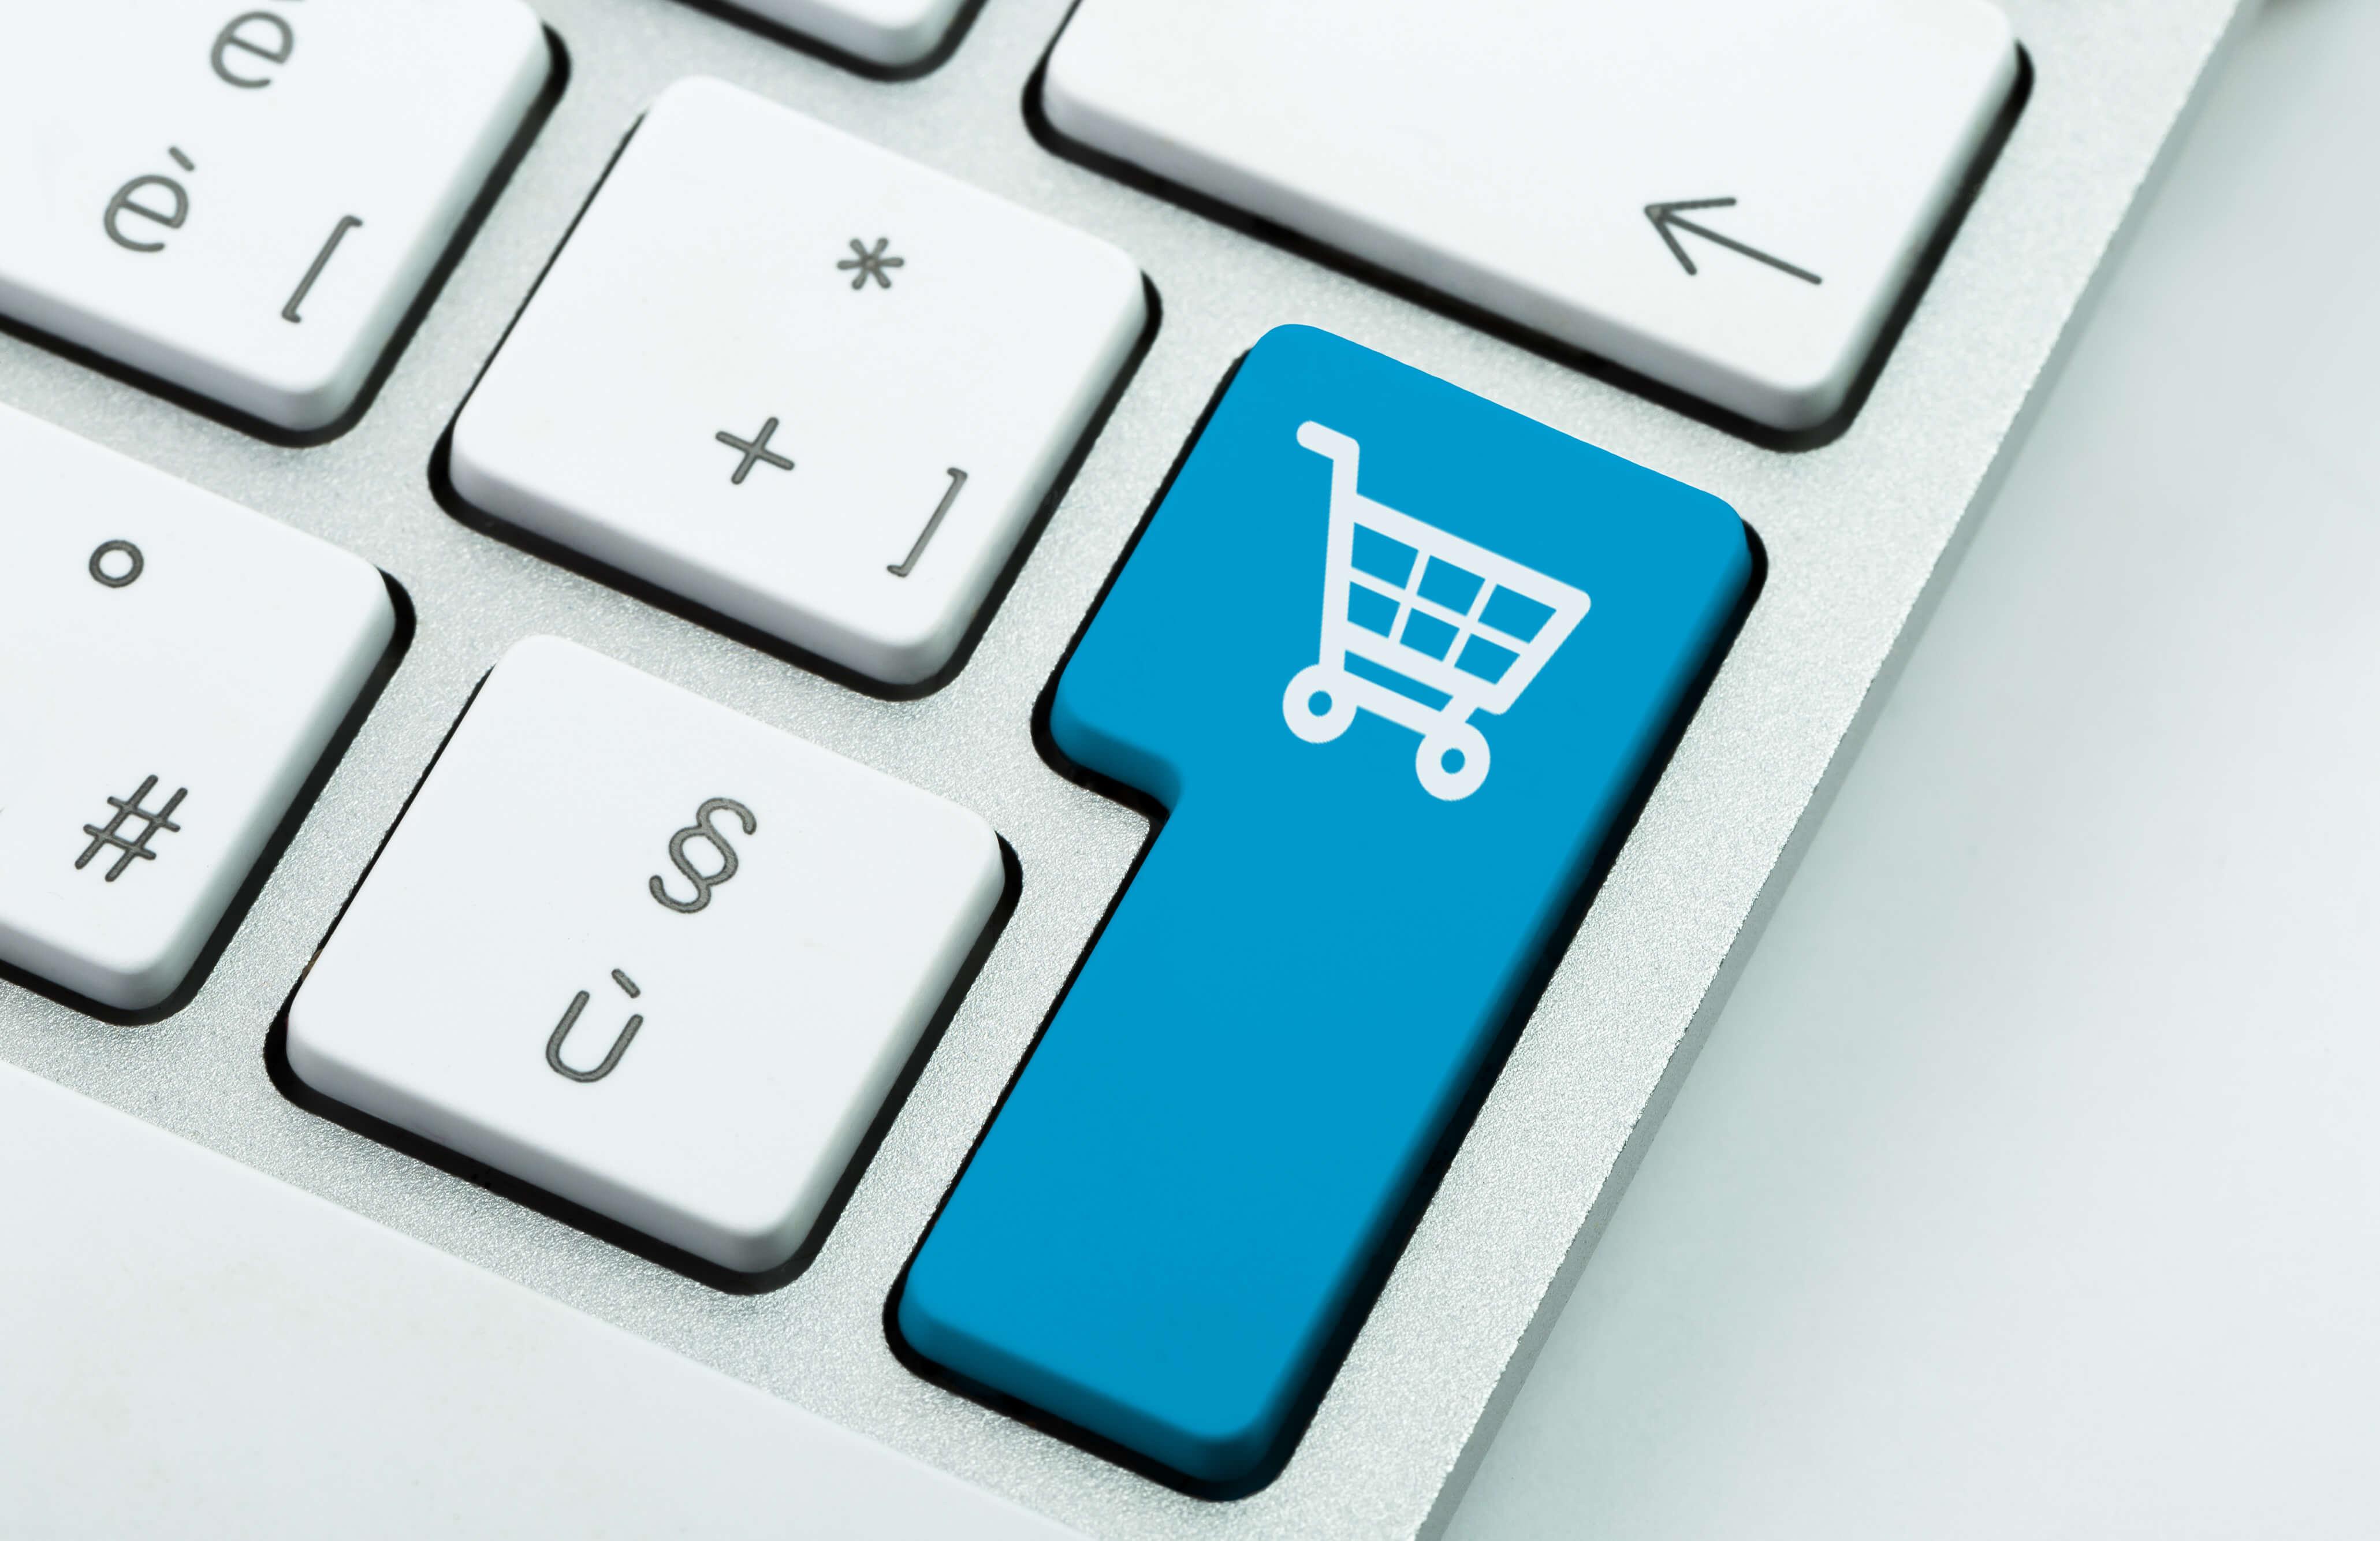 Consumer internet